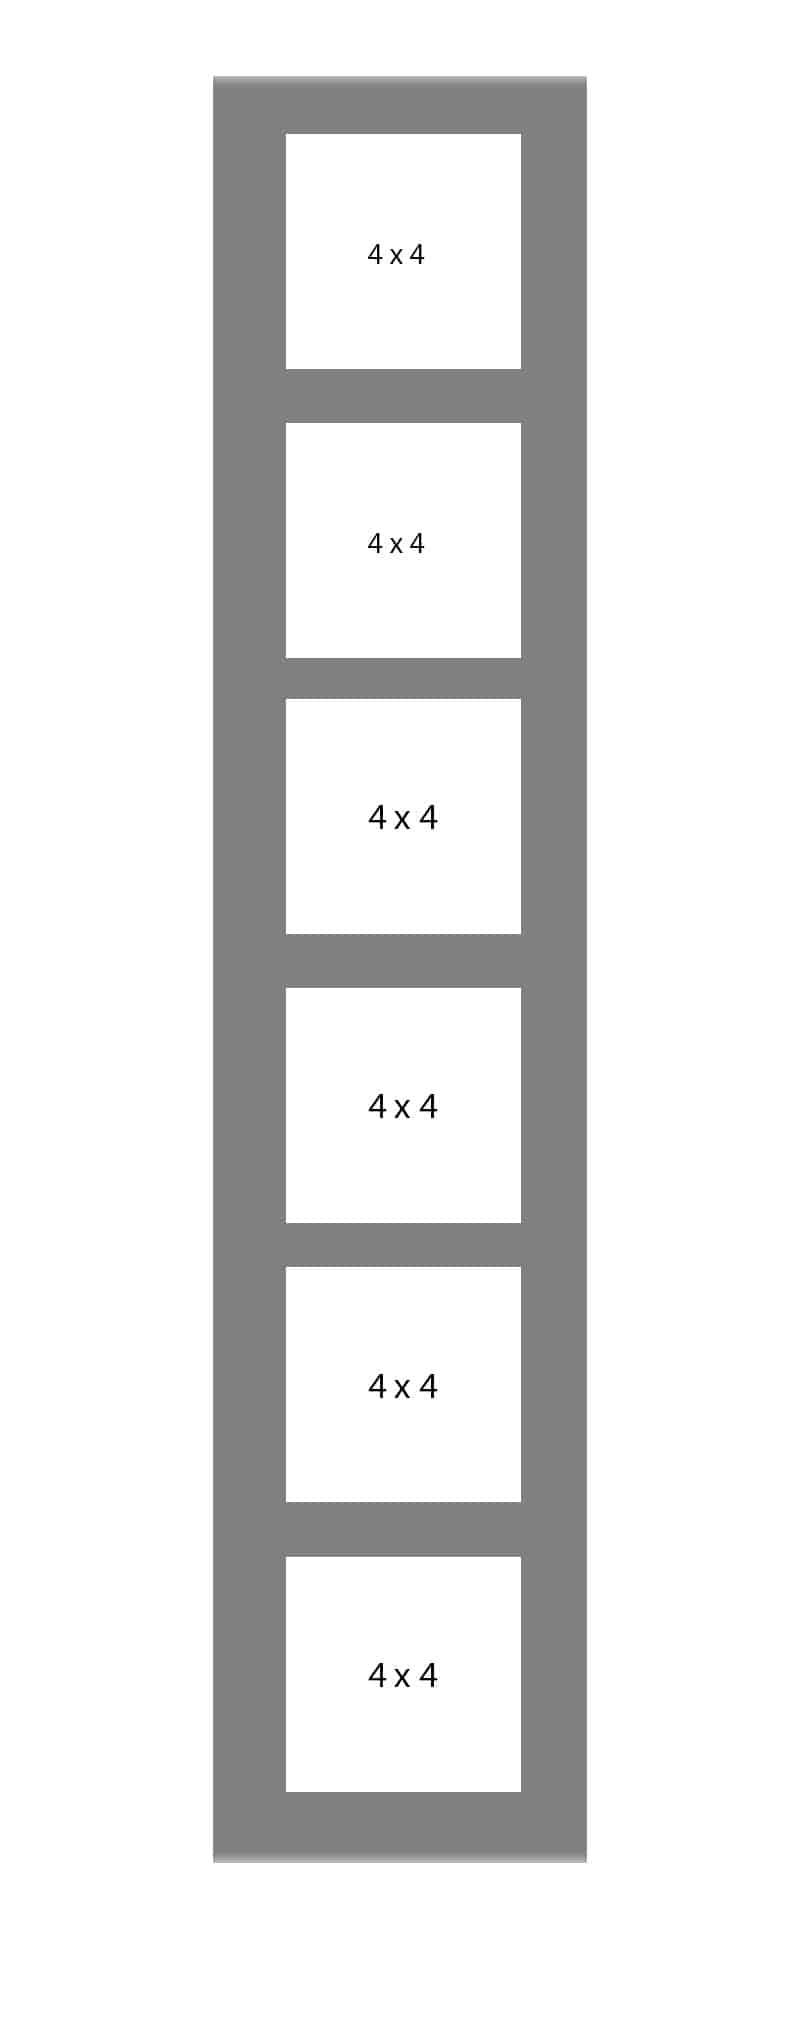 #143 EXMO 6-4x4 Openings